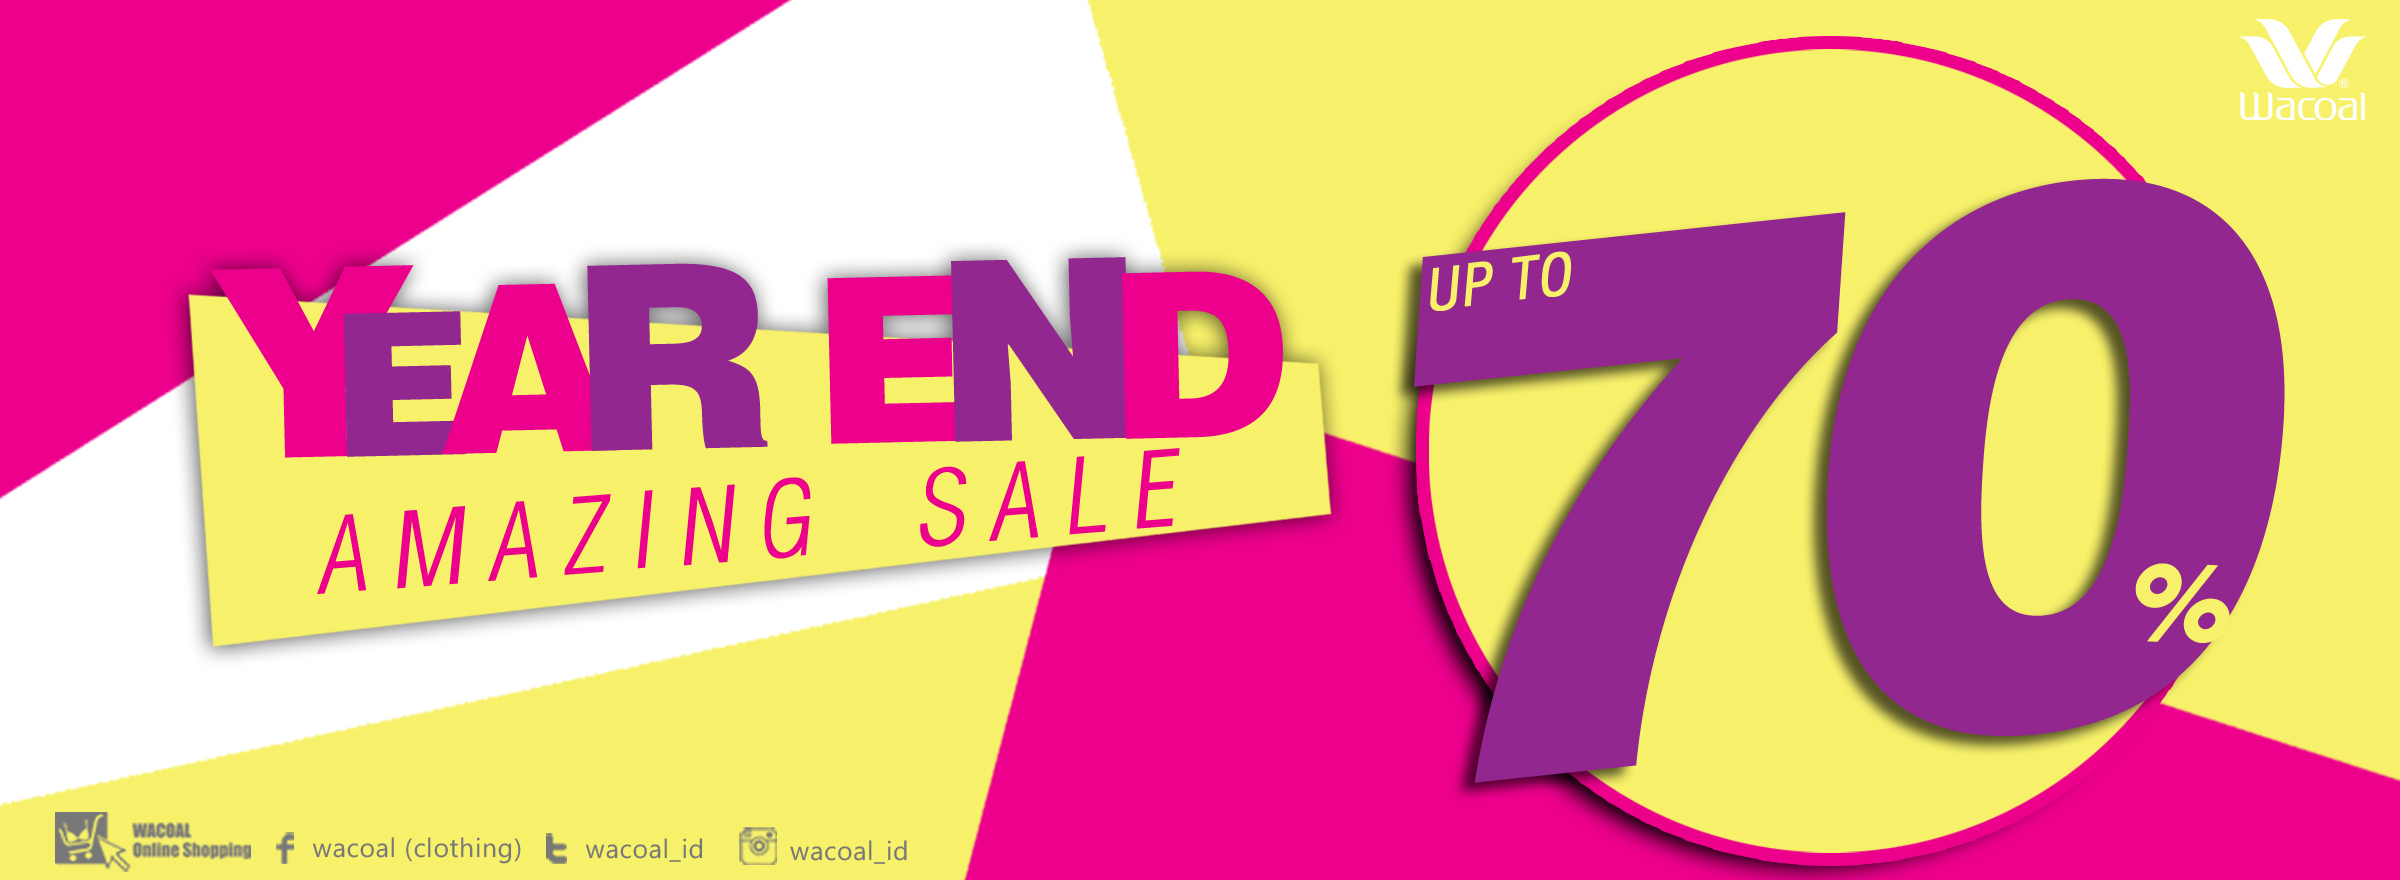 yearend amazing sale 70